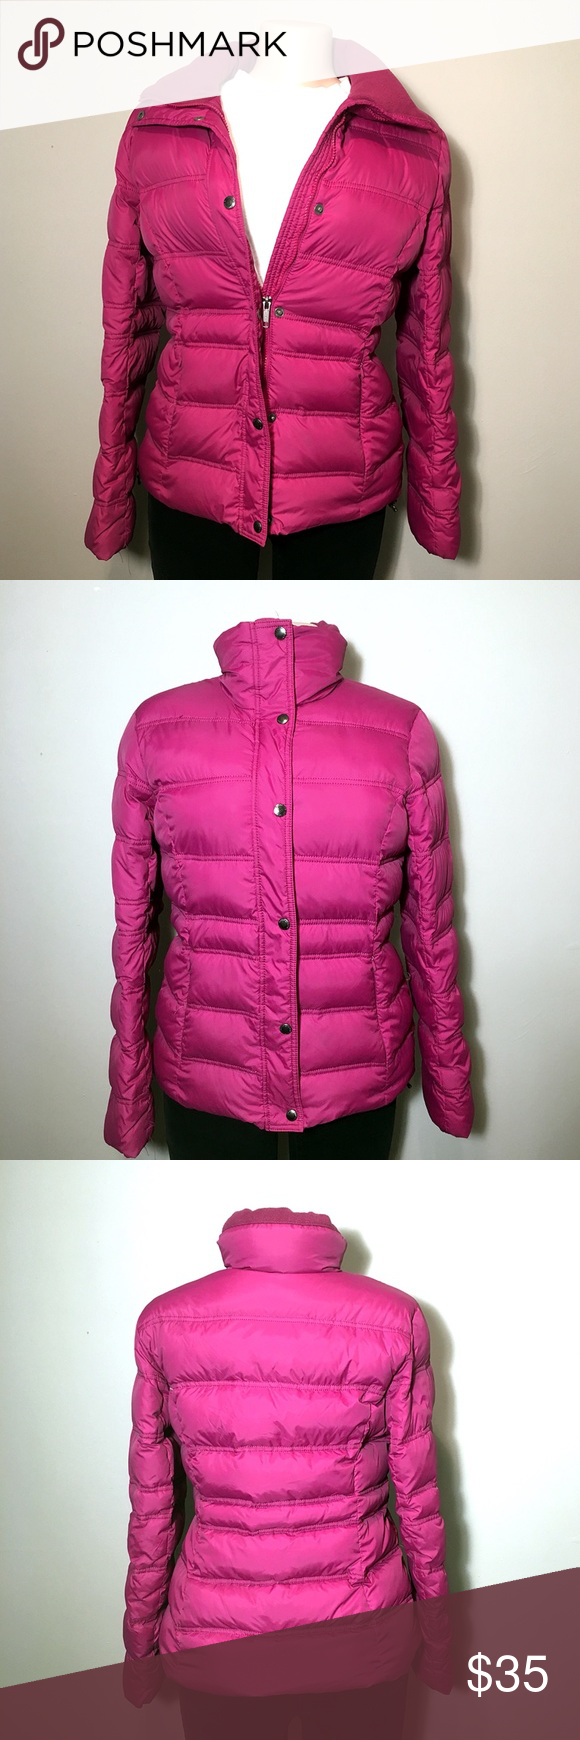 Land S End Pink Puffer Jacket B9 Clothes Design Jackets Puffer Jackets [ 1740 x 580 Pixel ]